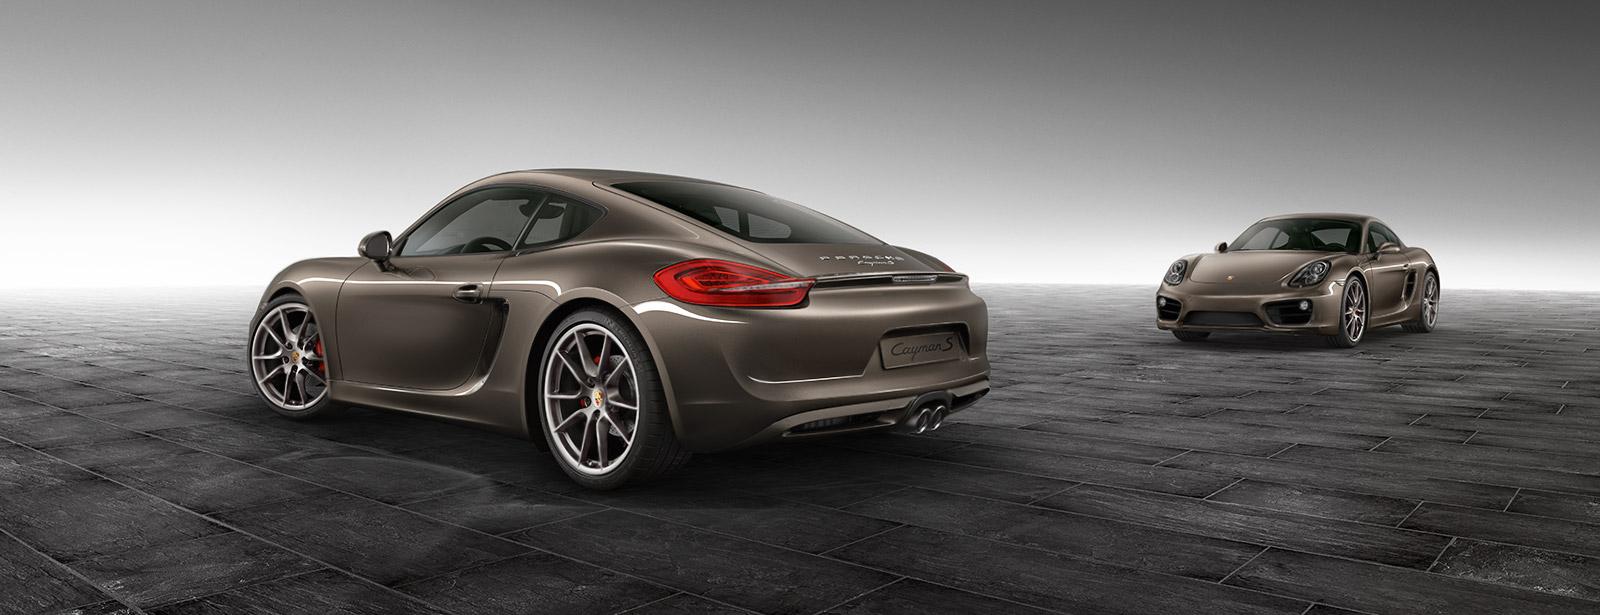 Porsche Experience Center >> Cayman S Anthracite Brown Metallic - Cayman - Exclusive - Dr. Ing. h.c. F. Porsche AG